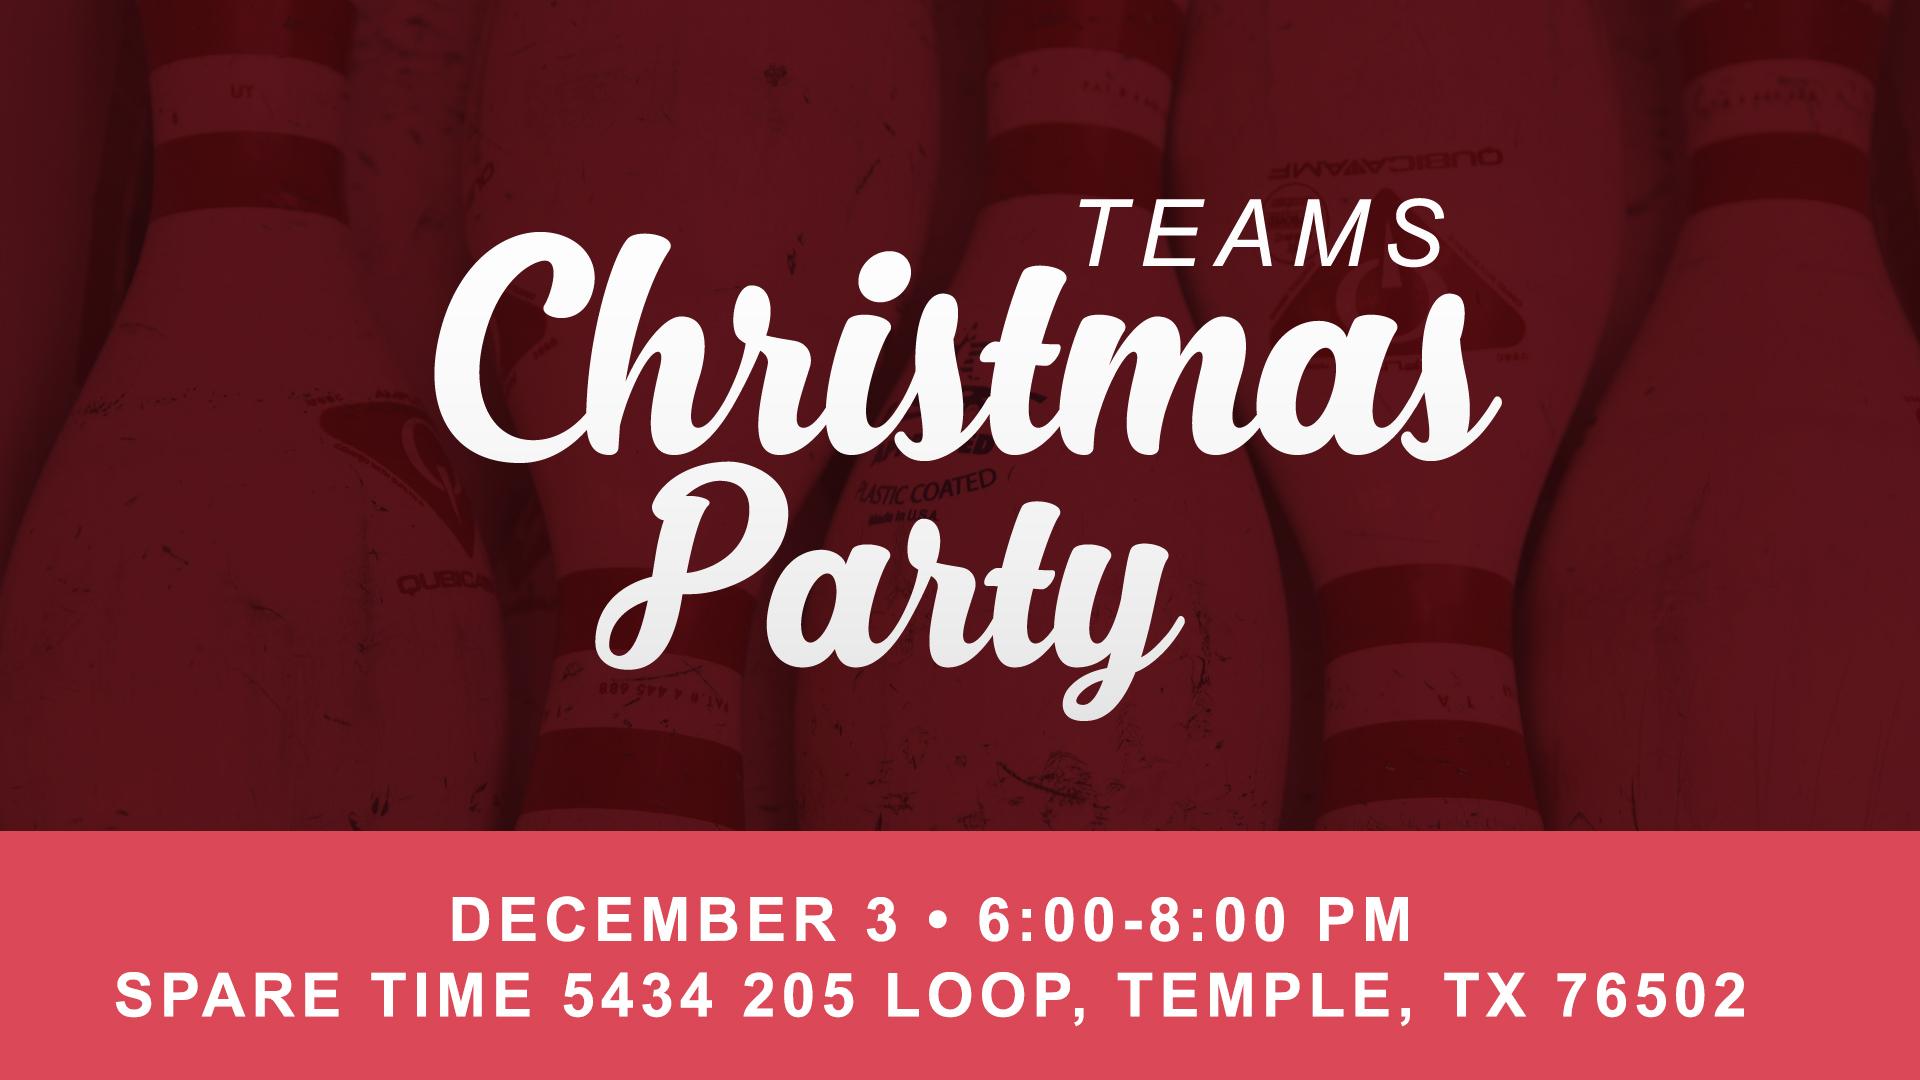 Teams Christmas Party.jpg